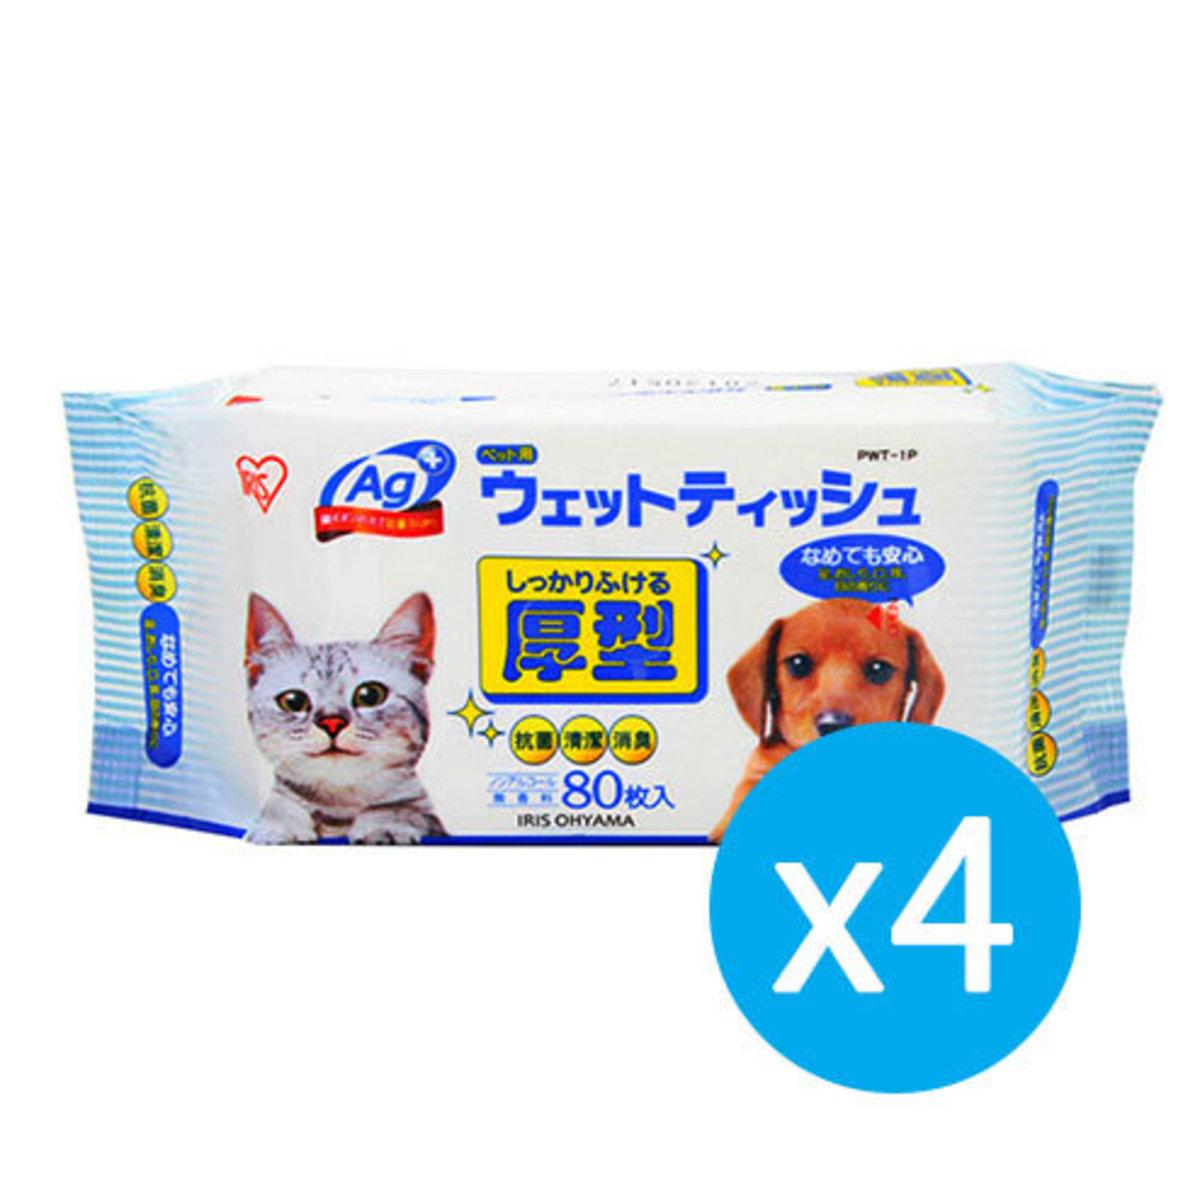 (4 packs)IRIS Thick Flexible Pet Wet Wipes 80 Pieces